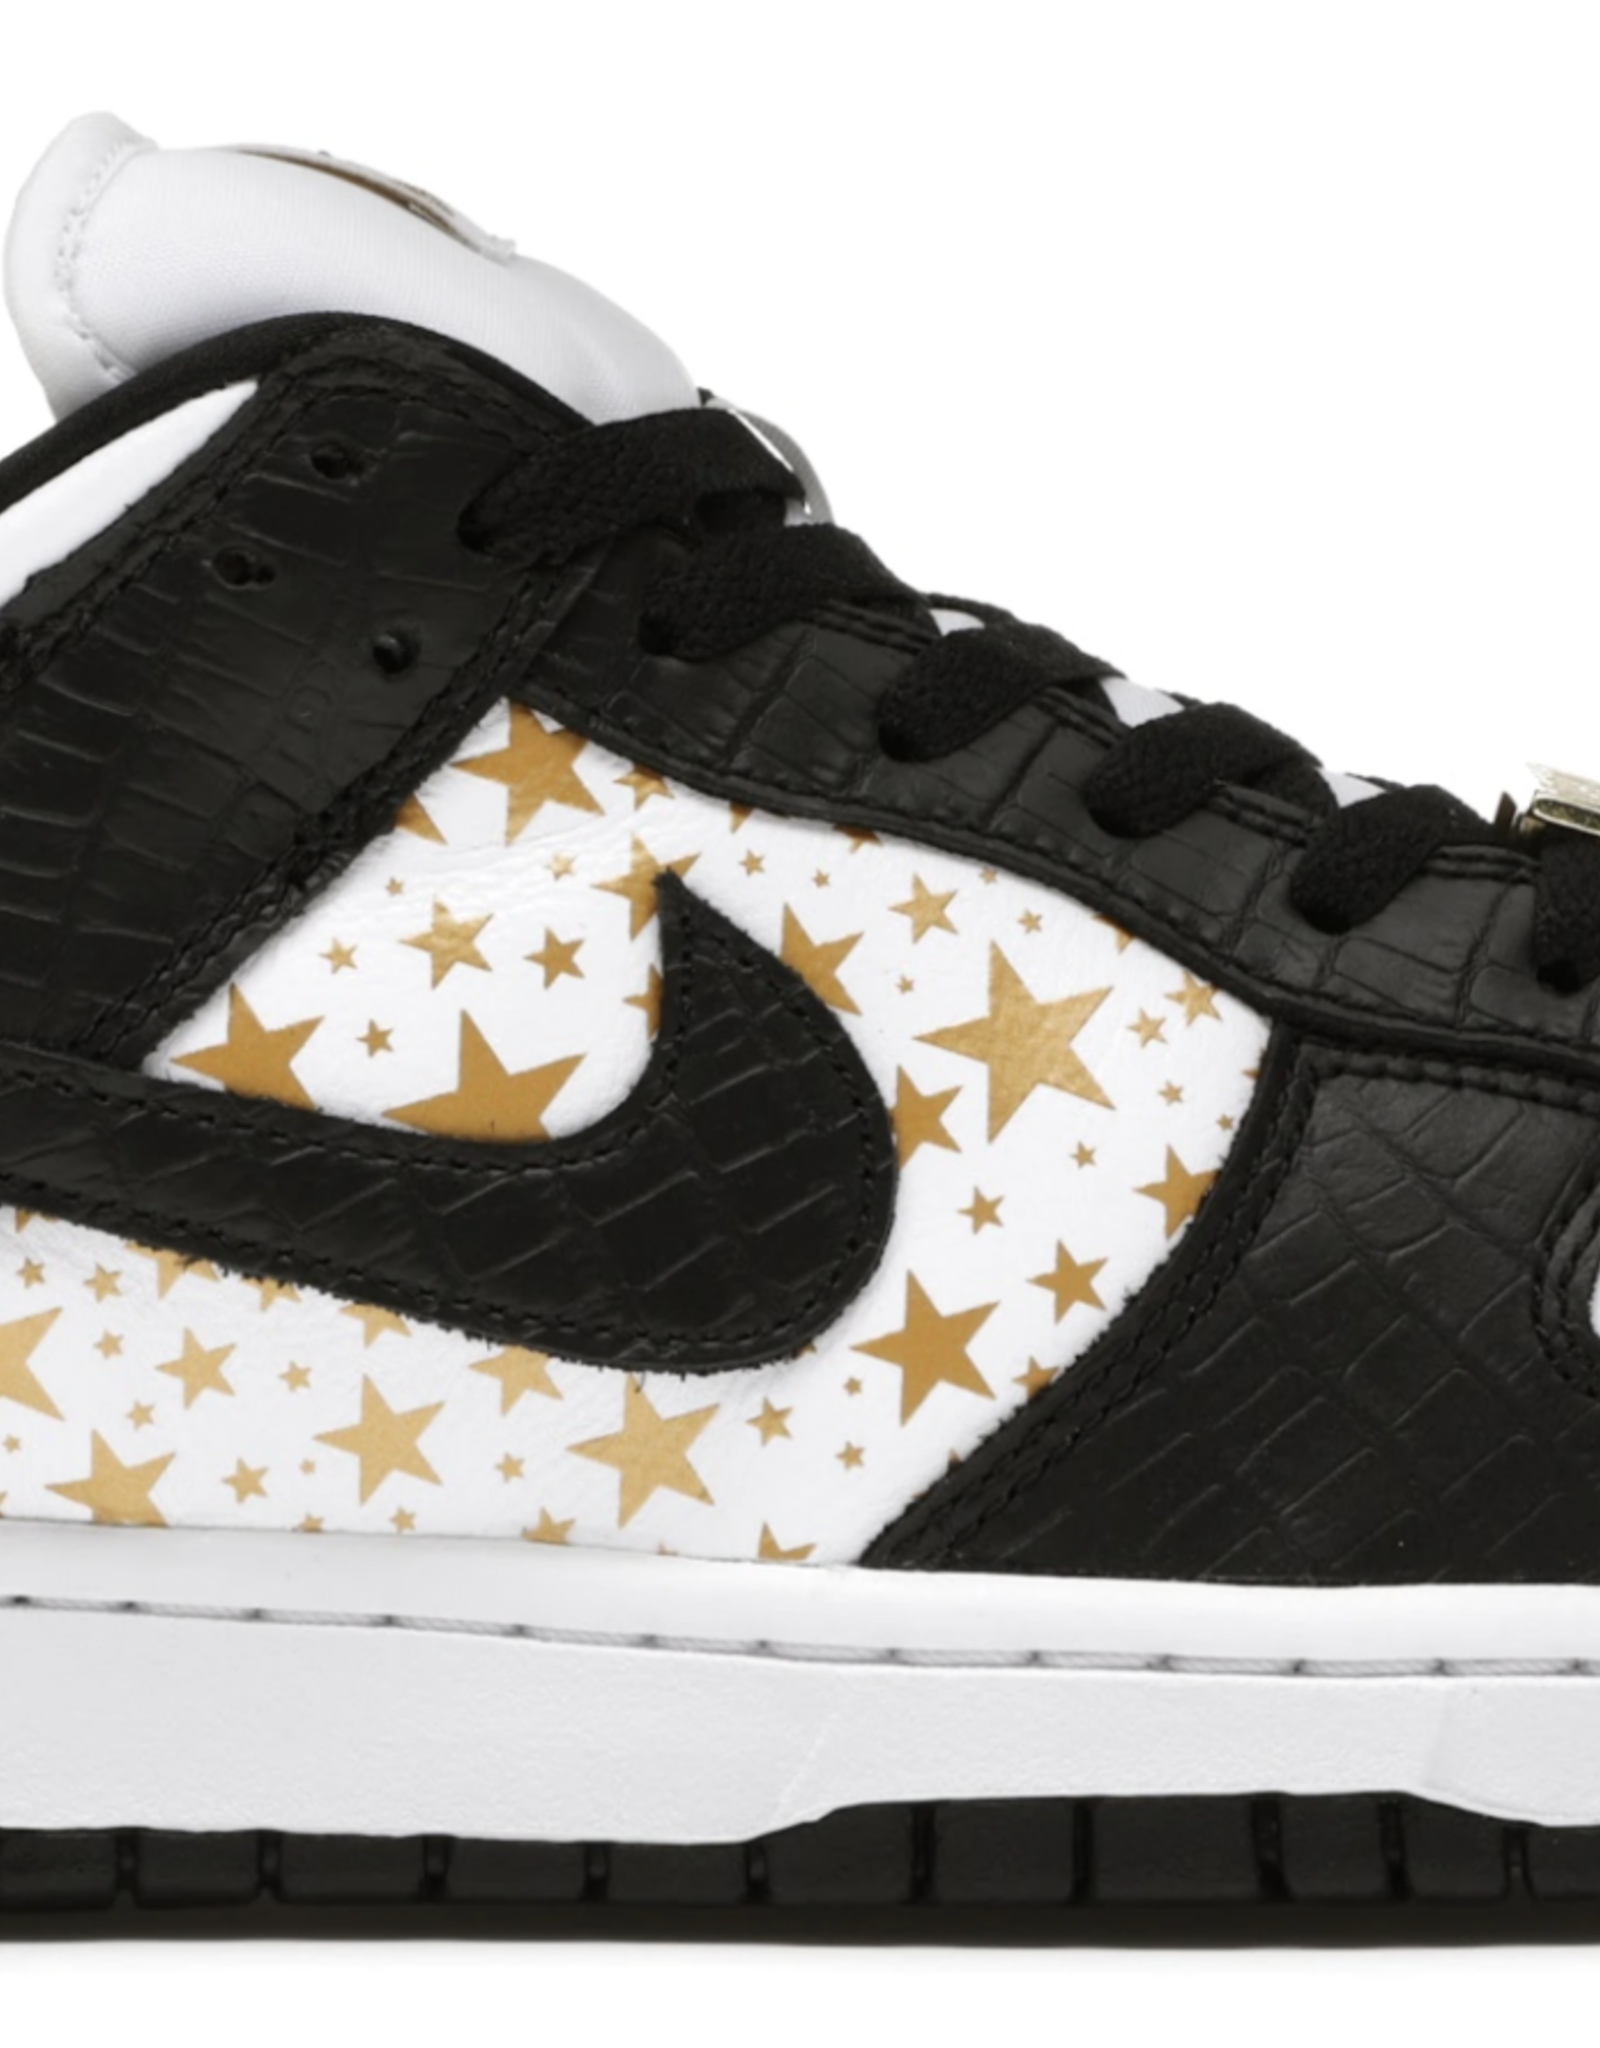 NIKE Nike SB Dunk Low Supreme Stars Black (2021)